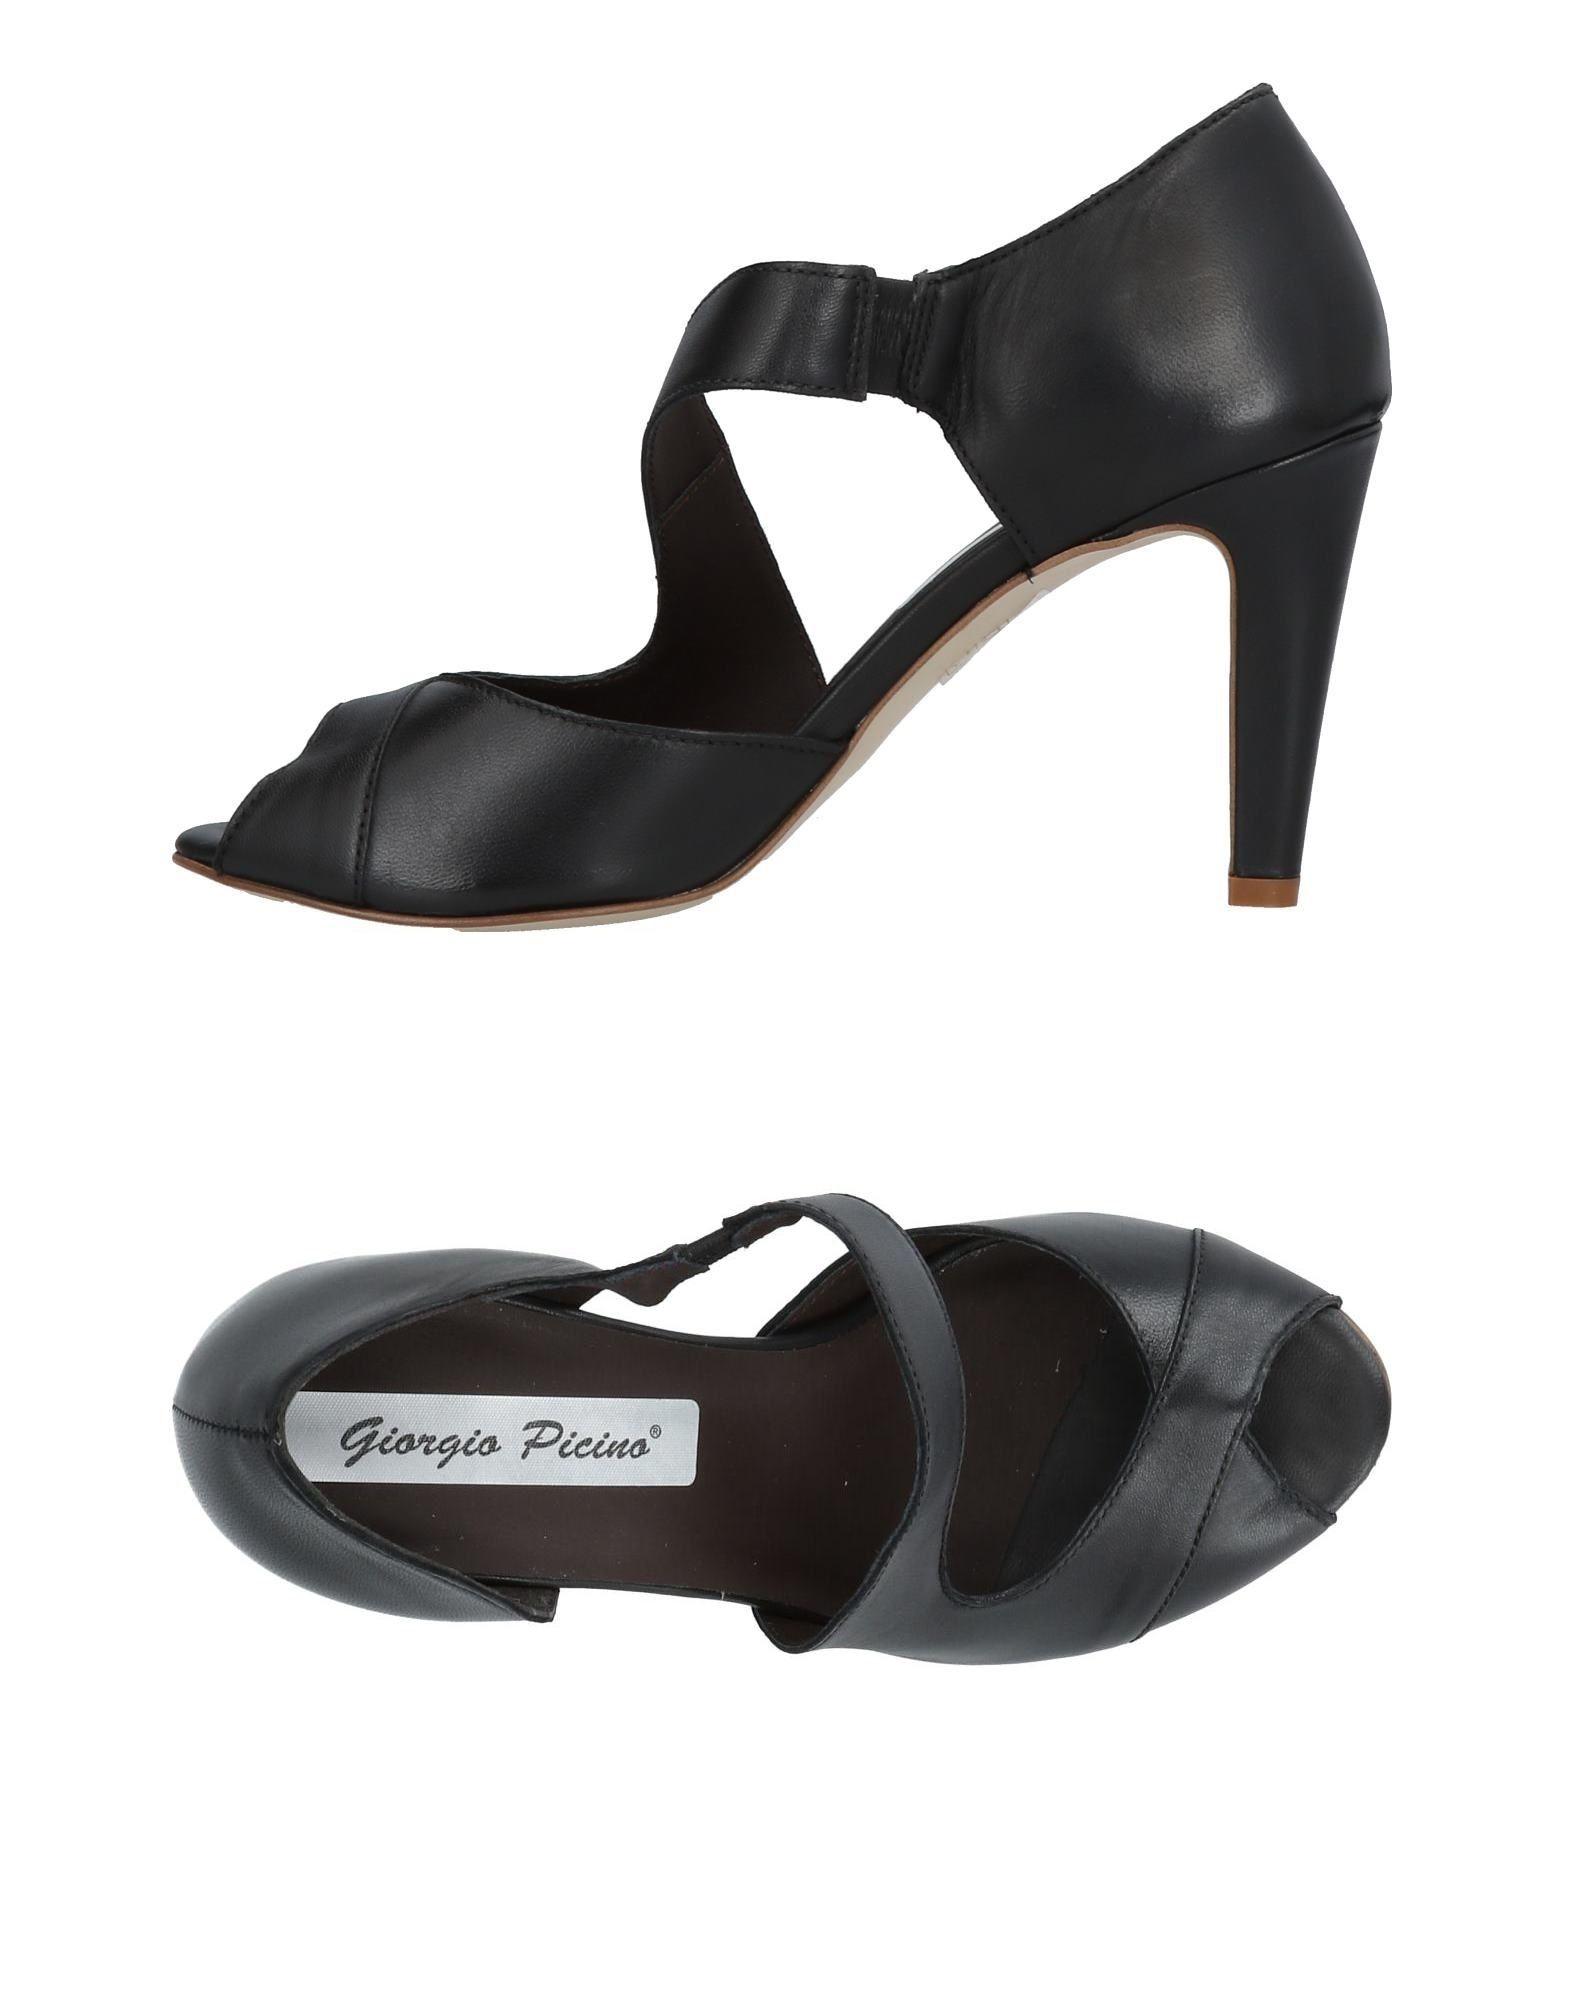 GIORGIO PICINO Туфли ankle boots giorgio picino ботильоны на толстом каблуке